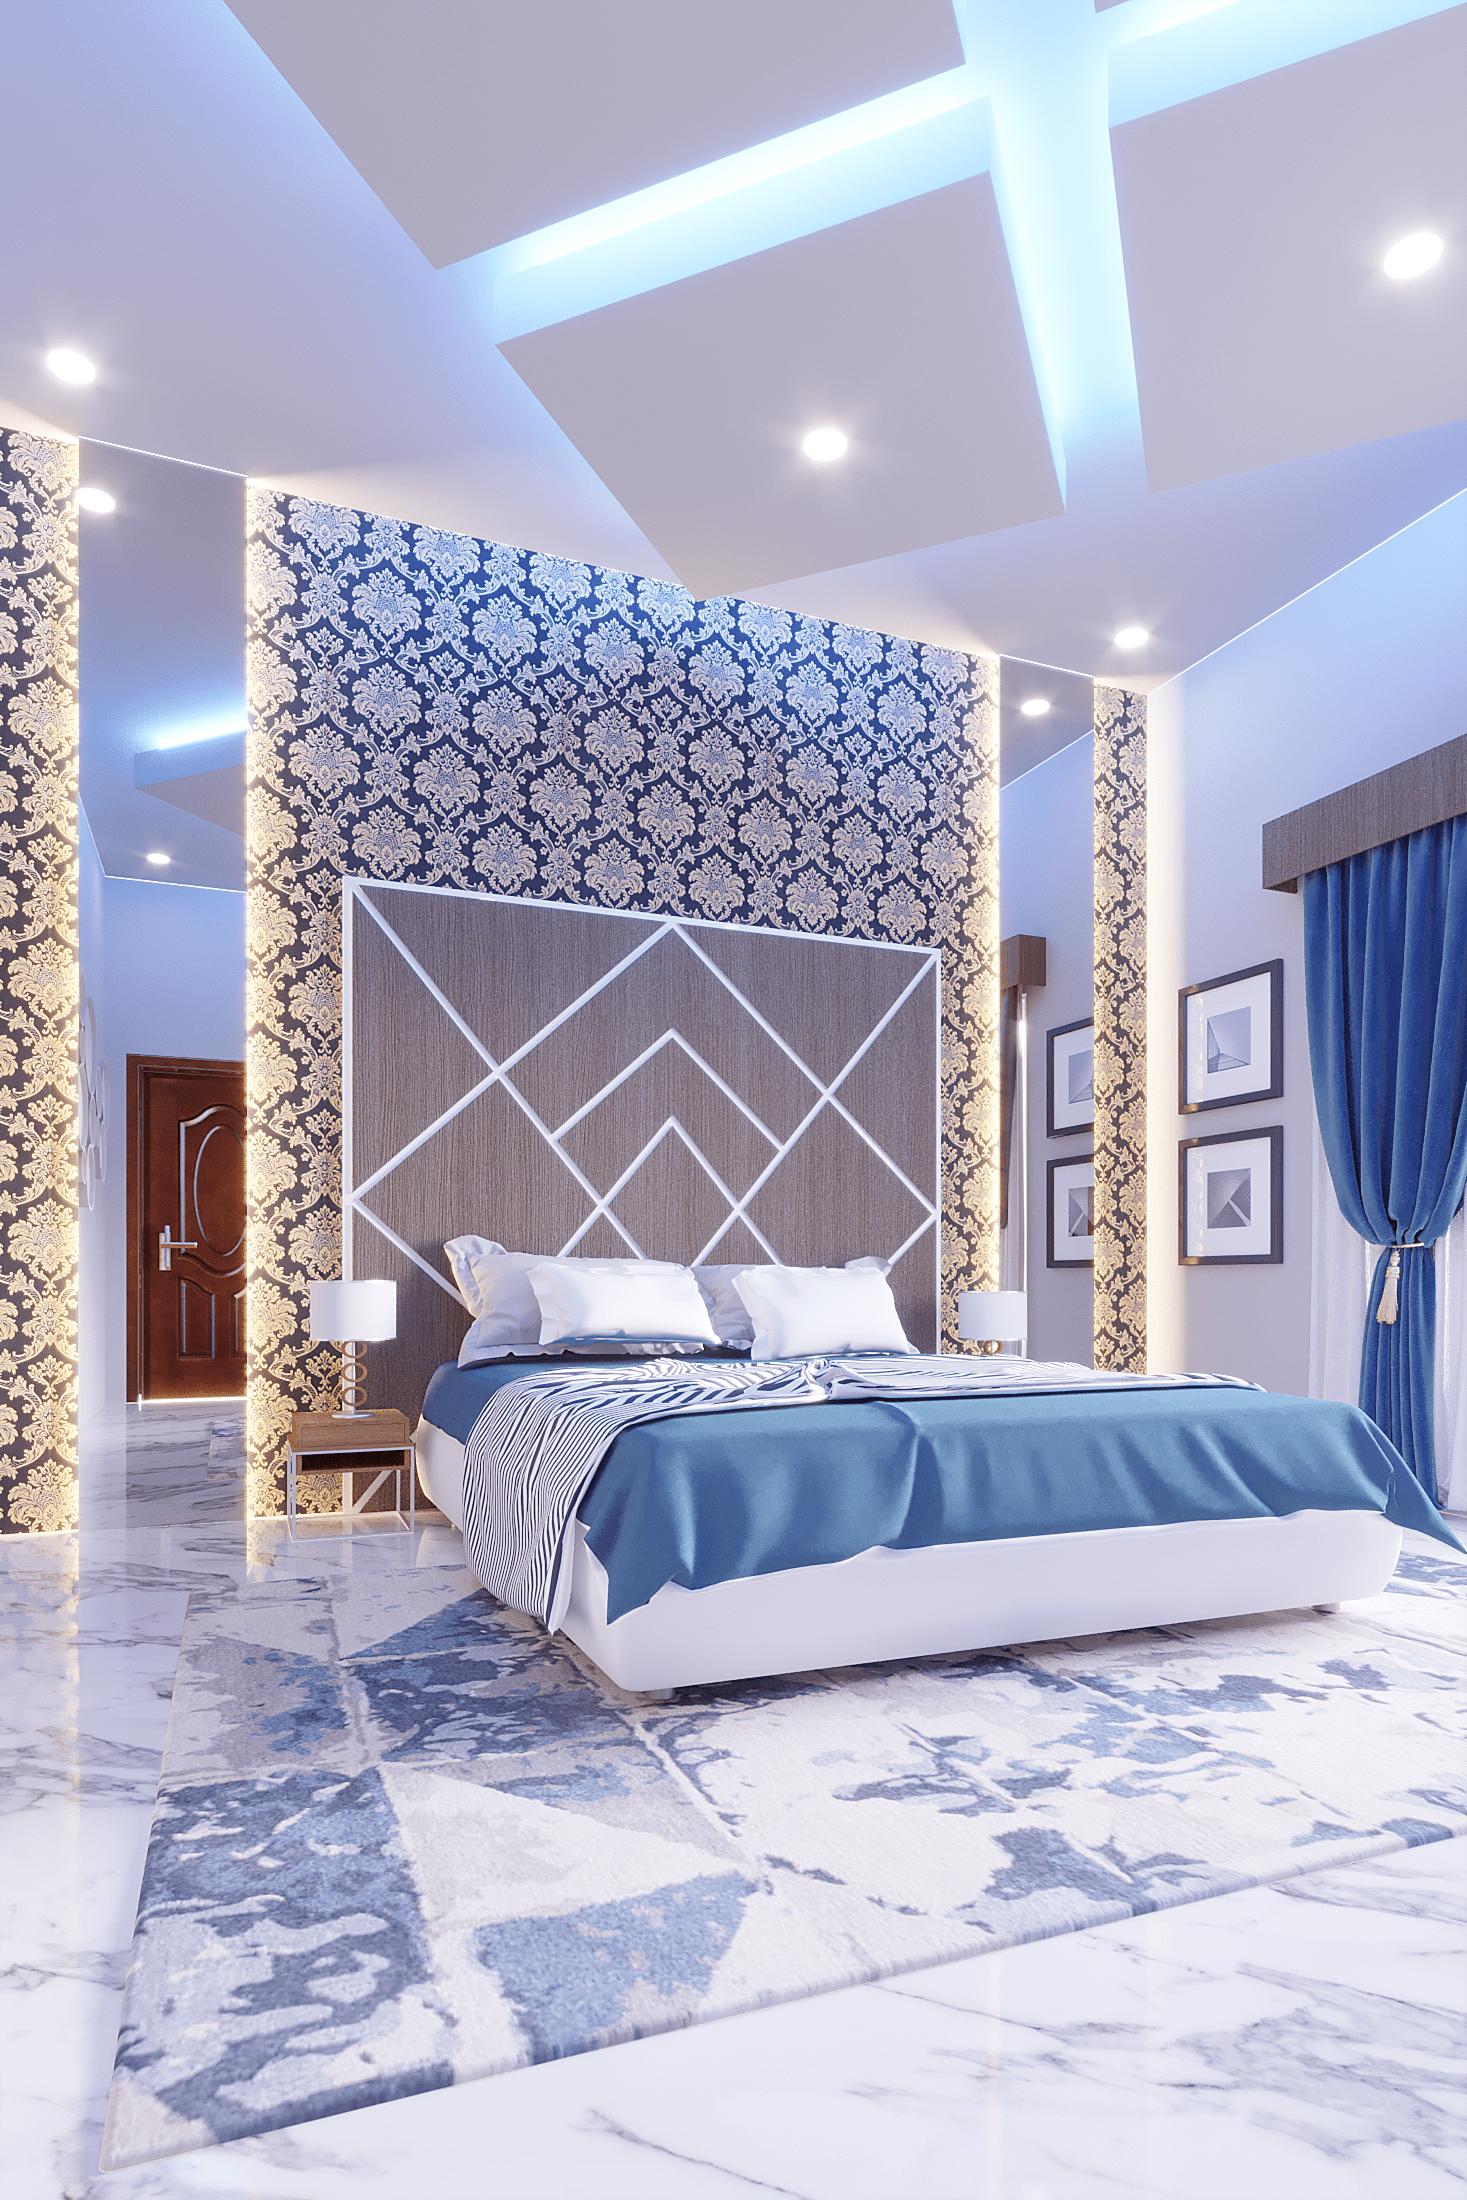 Bed Room inteiror Design